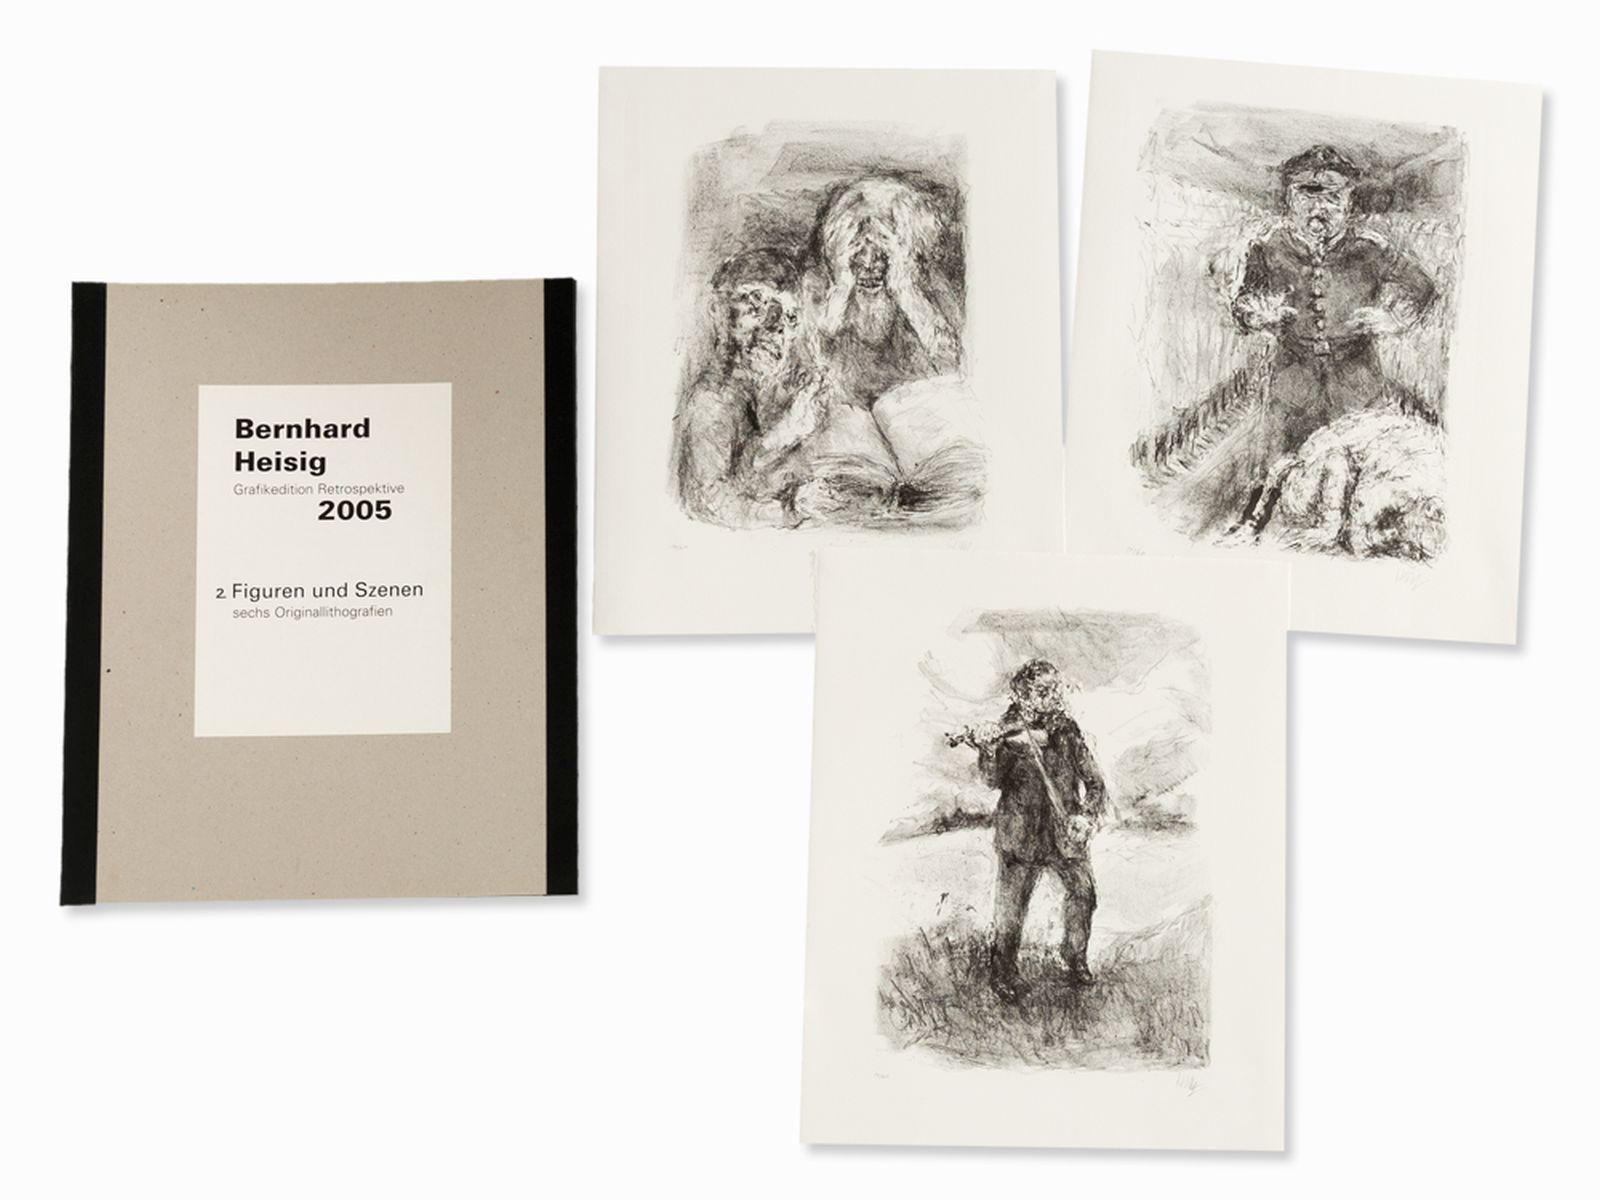 #111 Bernhard Heisig, Grafikedition Retrospektive, Portfolio, 2005 | Bernhard Heisig, Grafikedition Retrospektive 2005, Mappe, 2005 Image